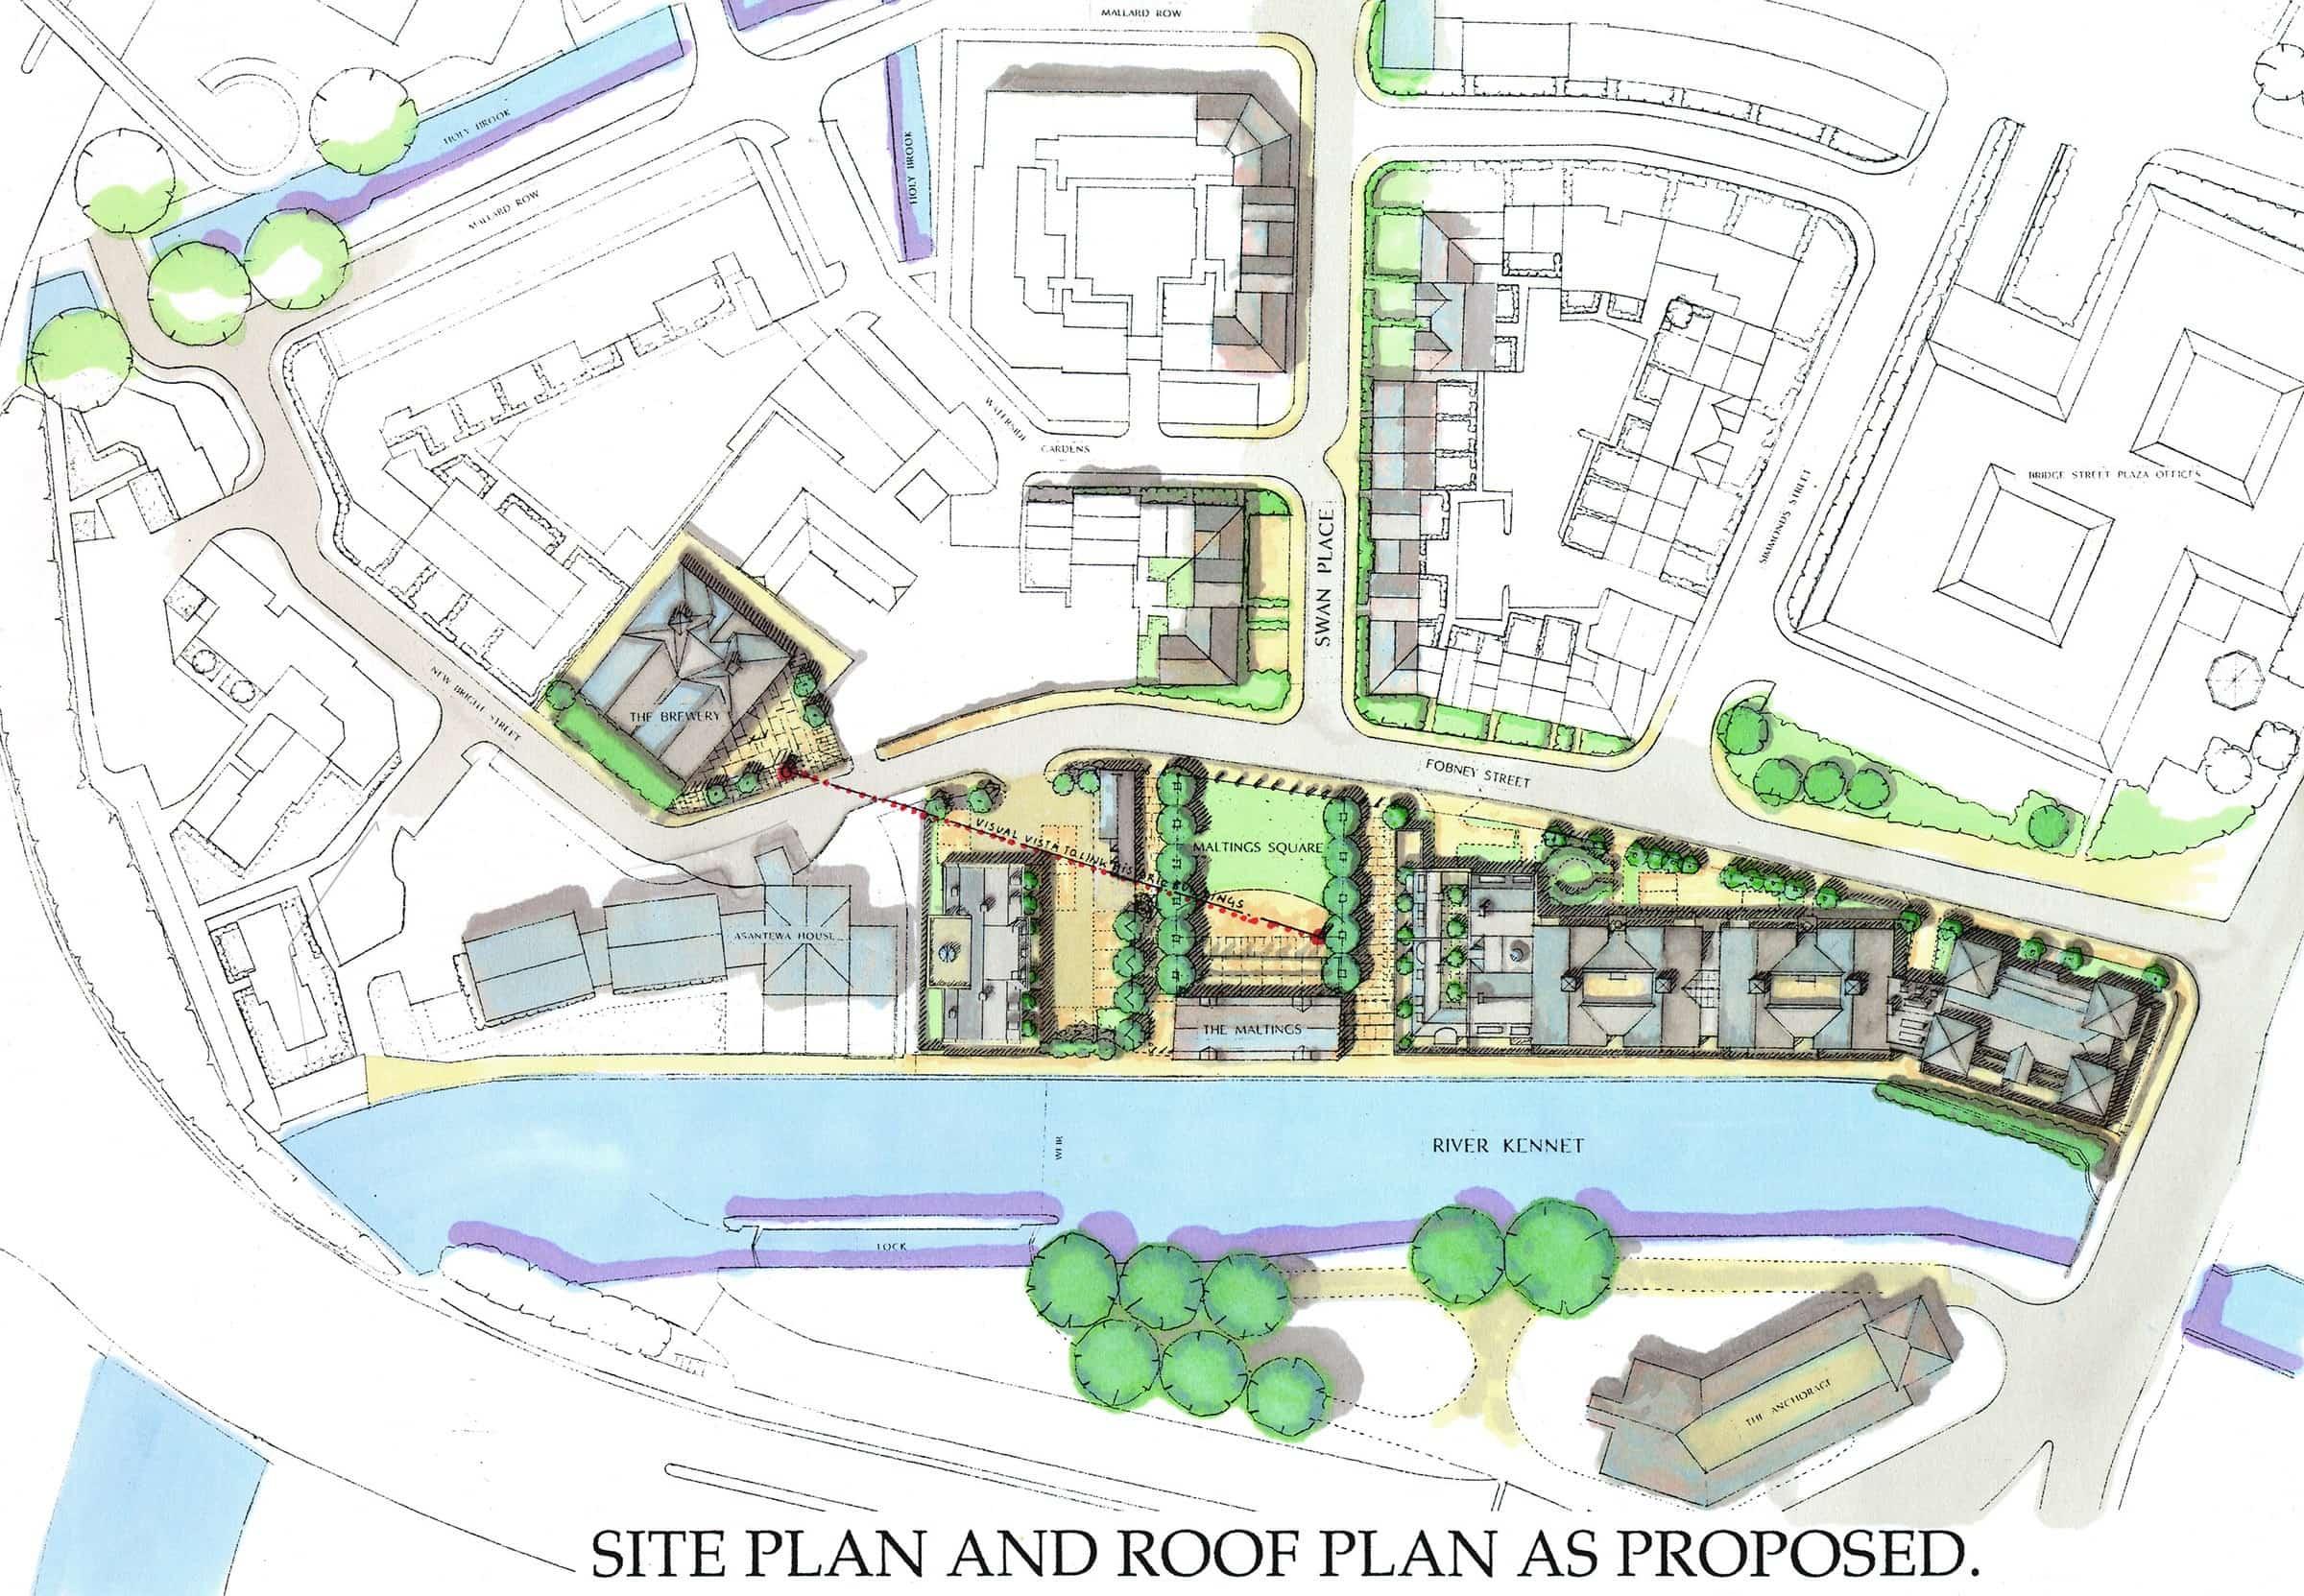 Canalside development at Bear Wharf, Reading